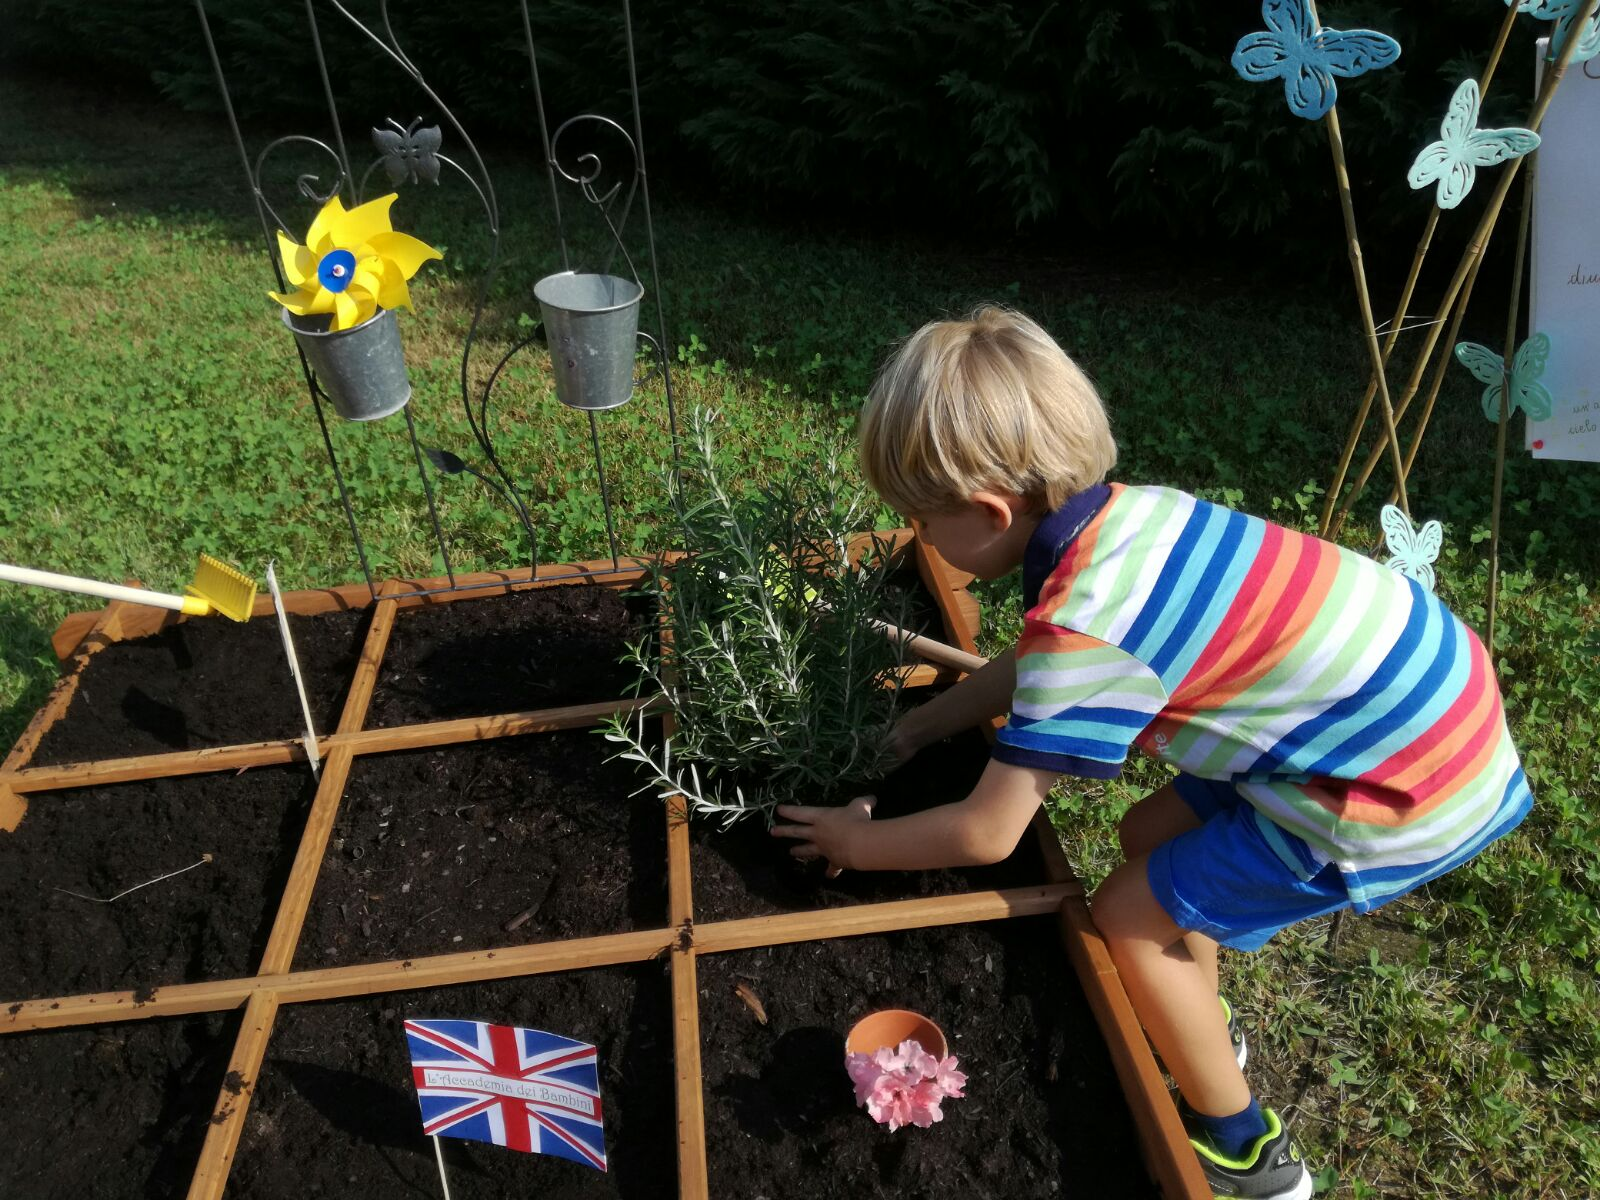 Bambino gioca in giardino piantando un albero